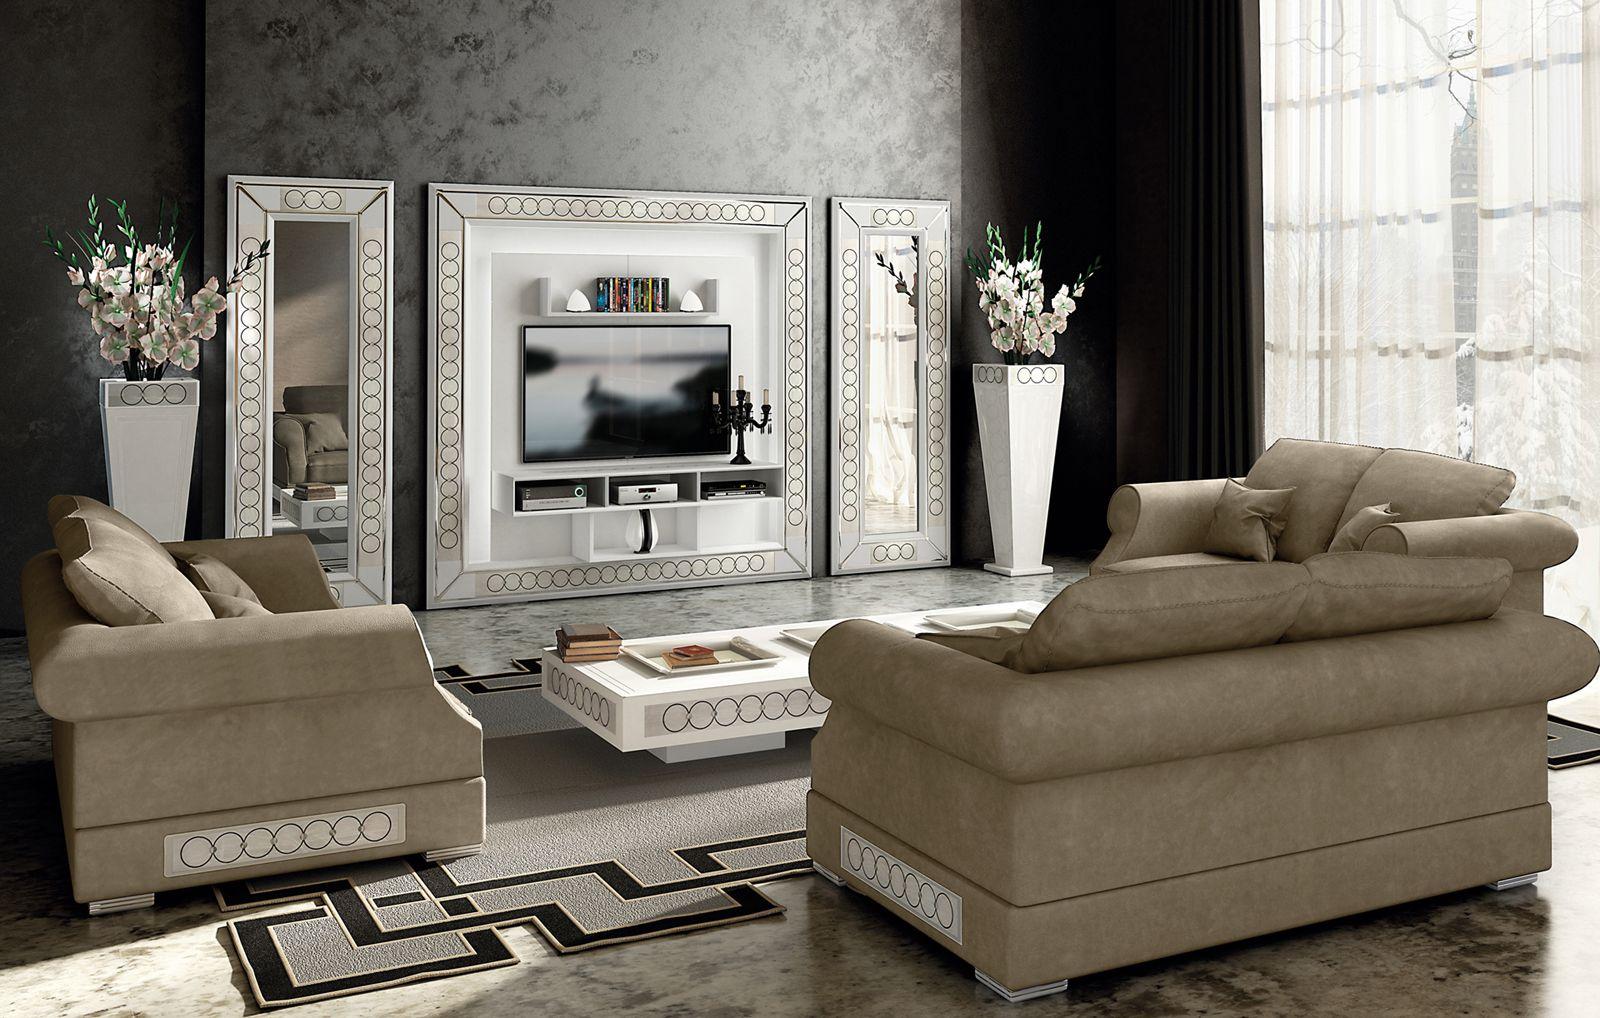 TV WALL UNIT Tv wall unit, Wall unit, Luxury furniture